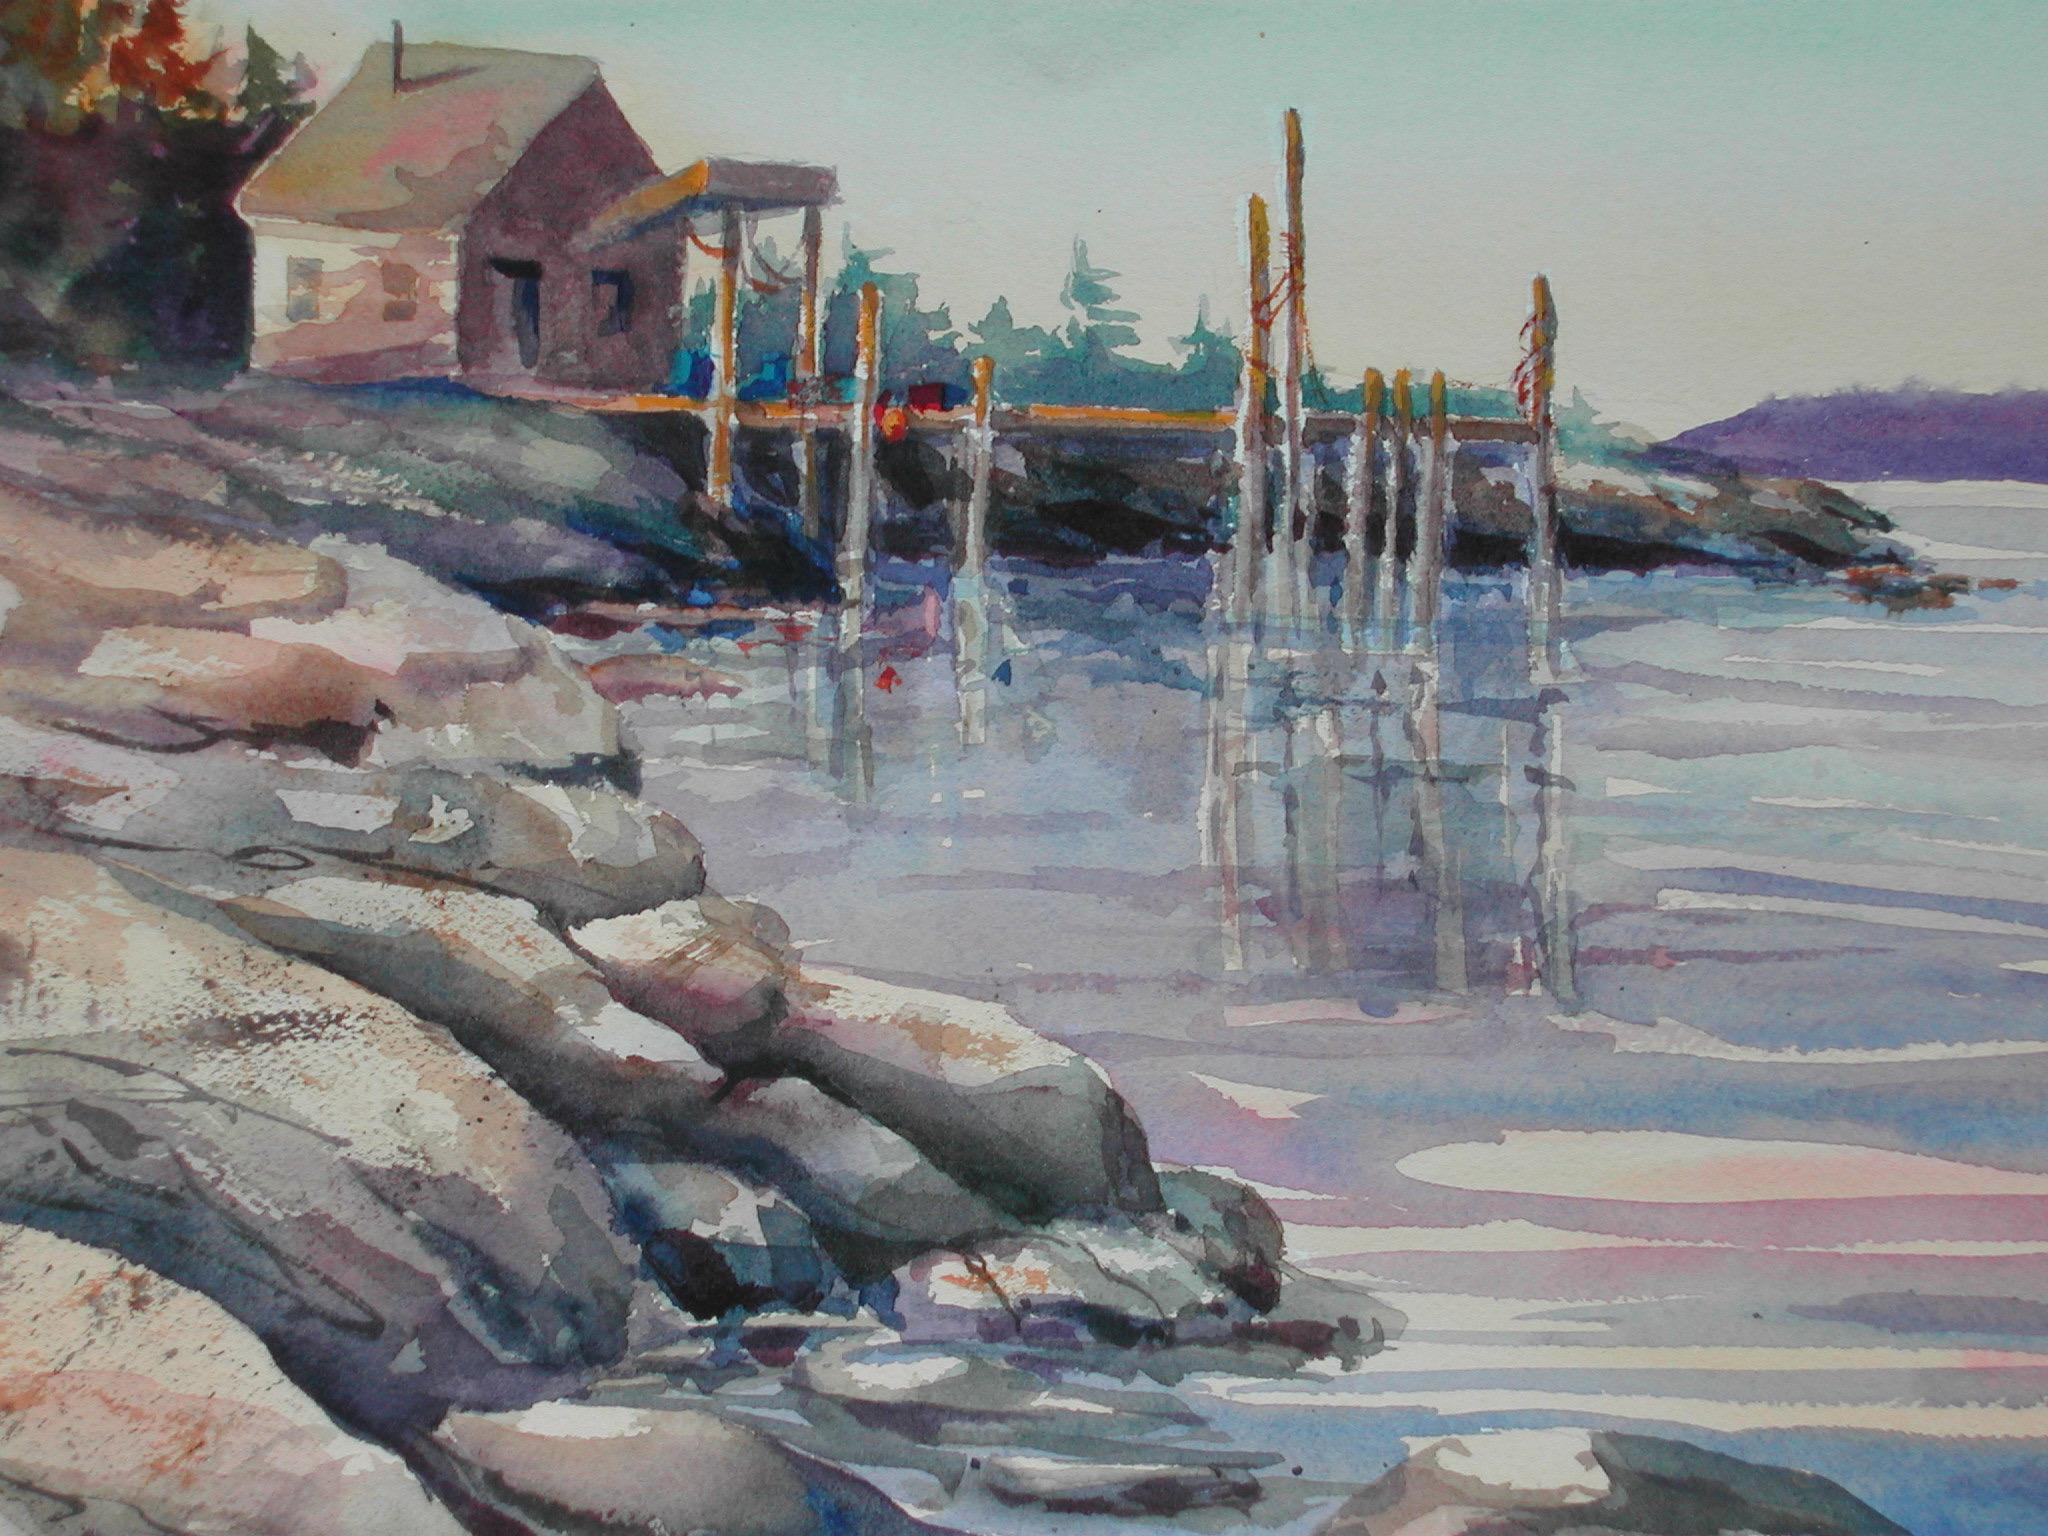 Lowell Cove, watercolor, 11 x 15